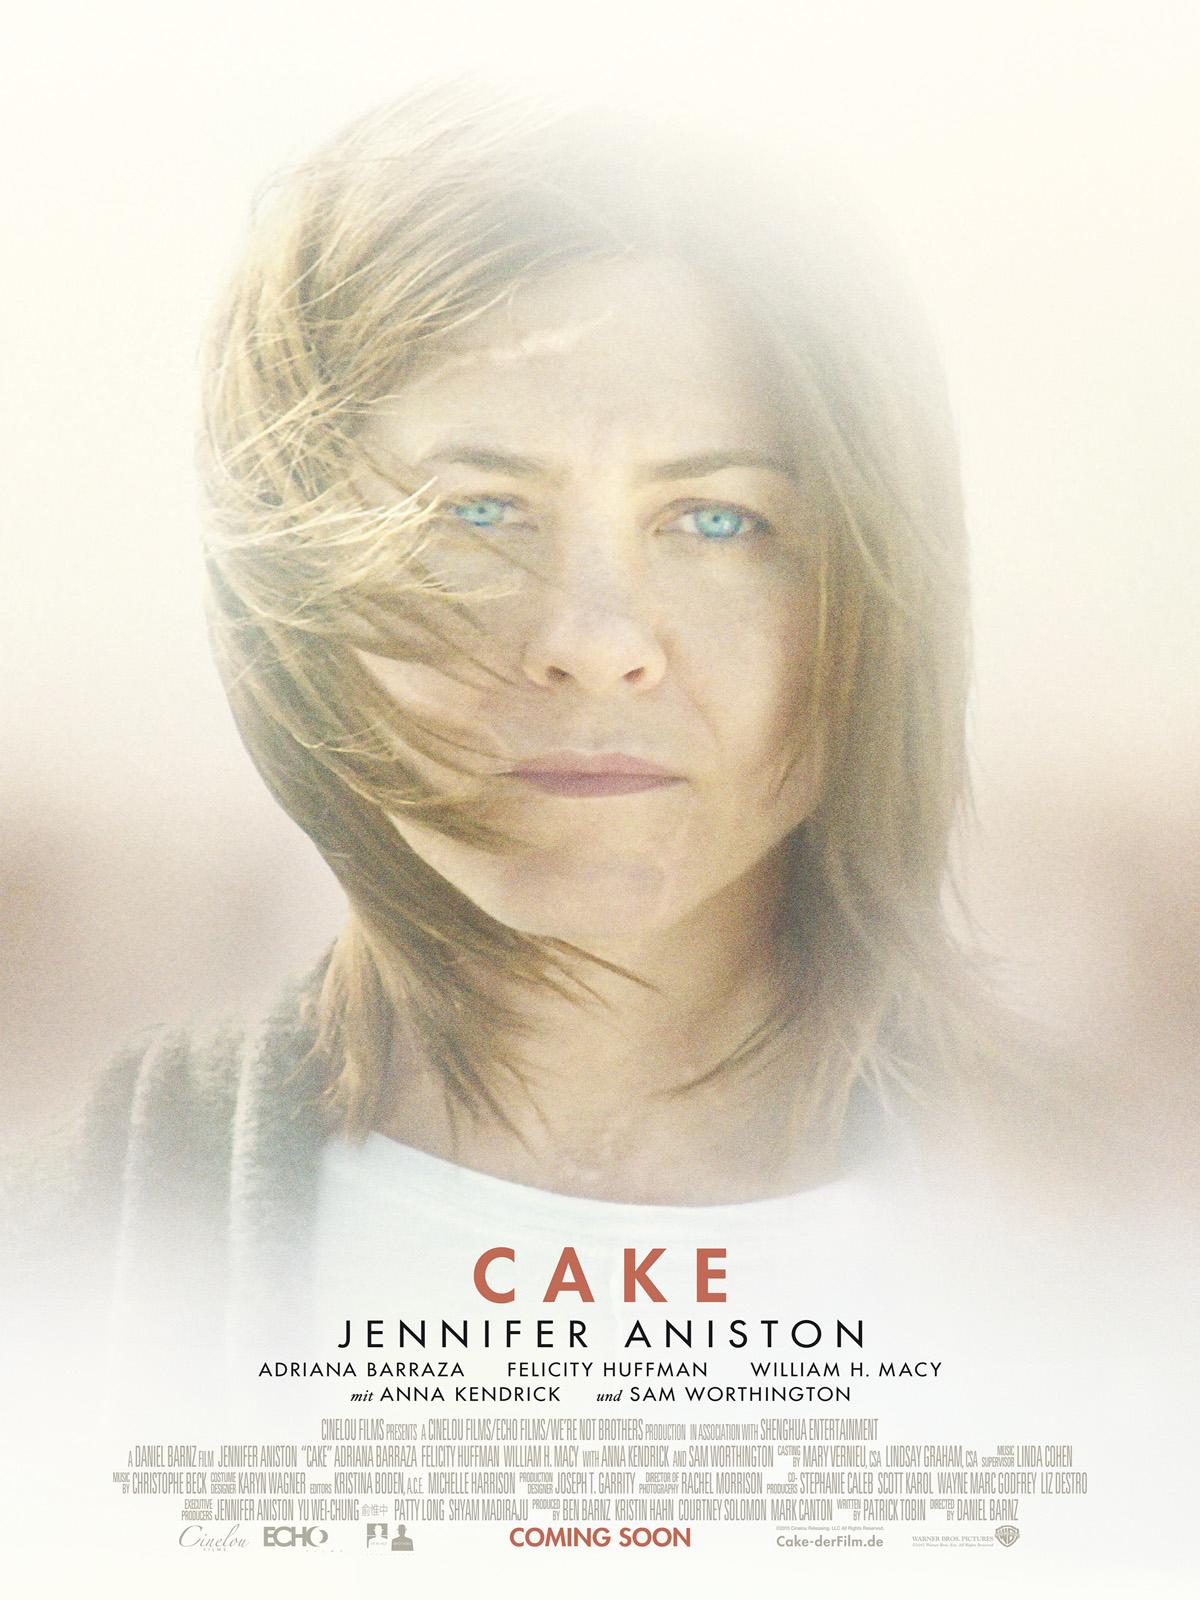 Aniston Cake Trailer